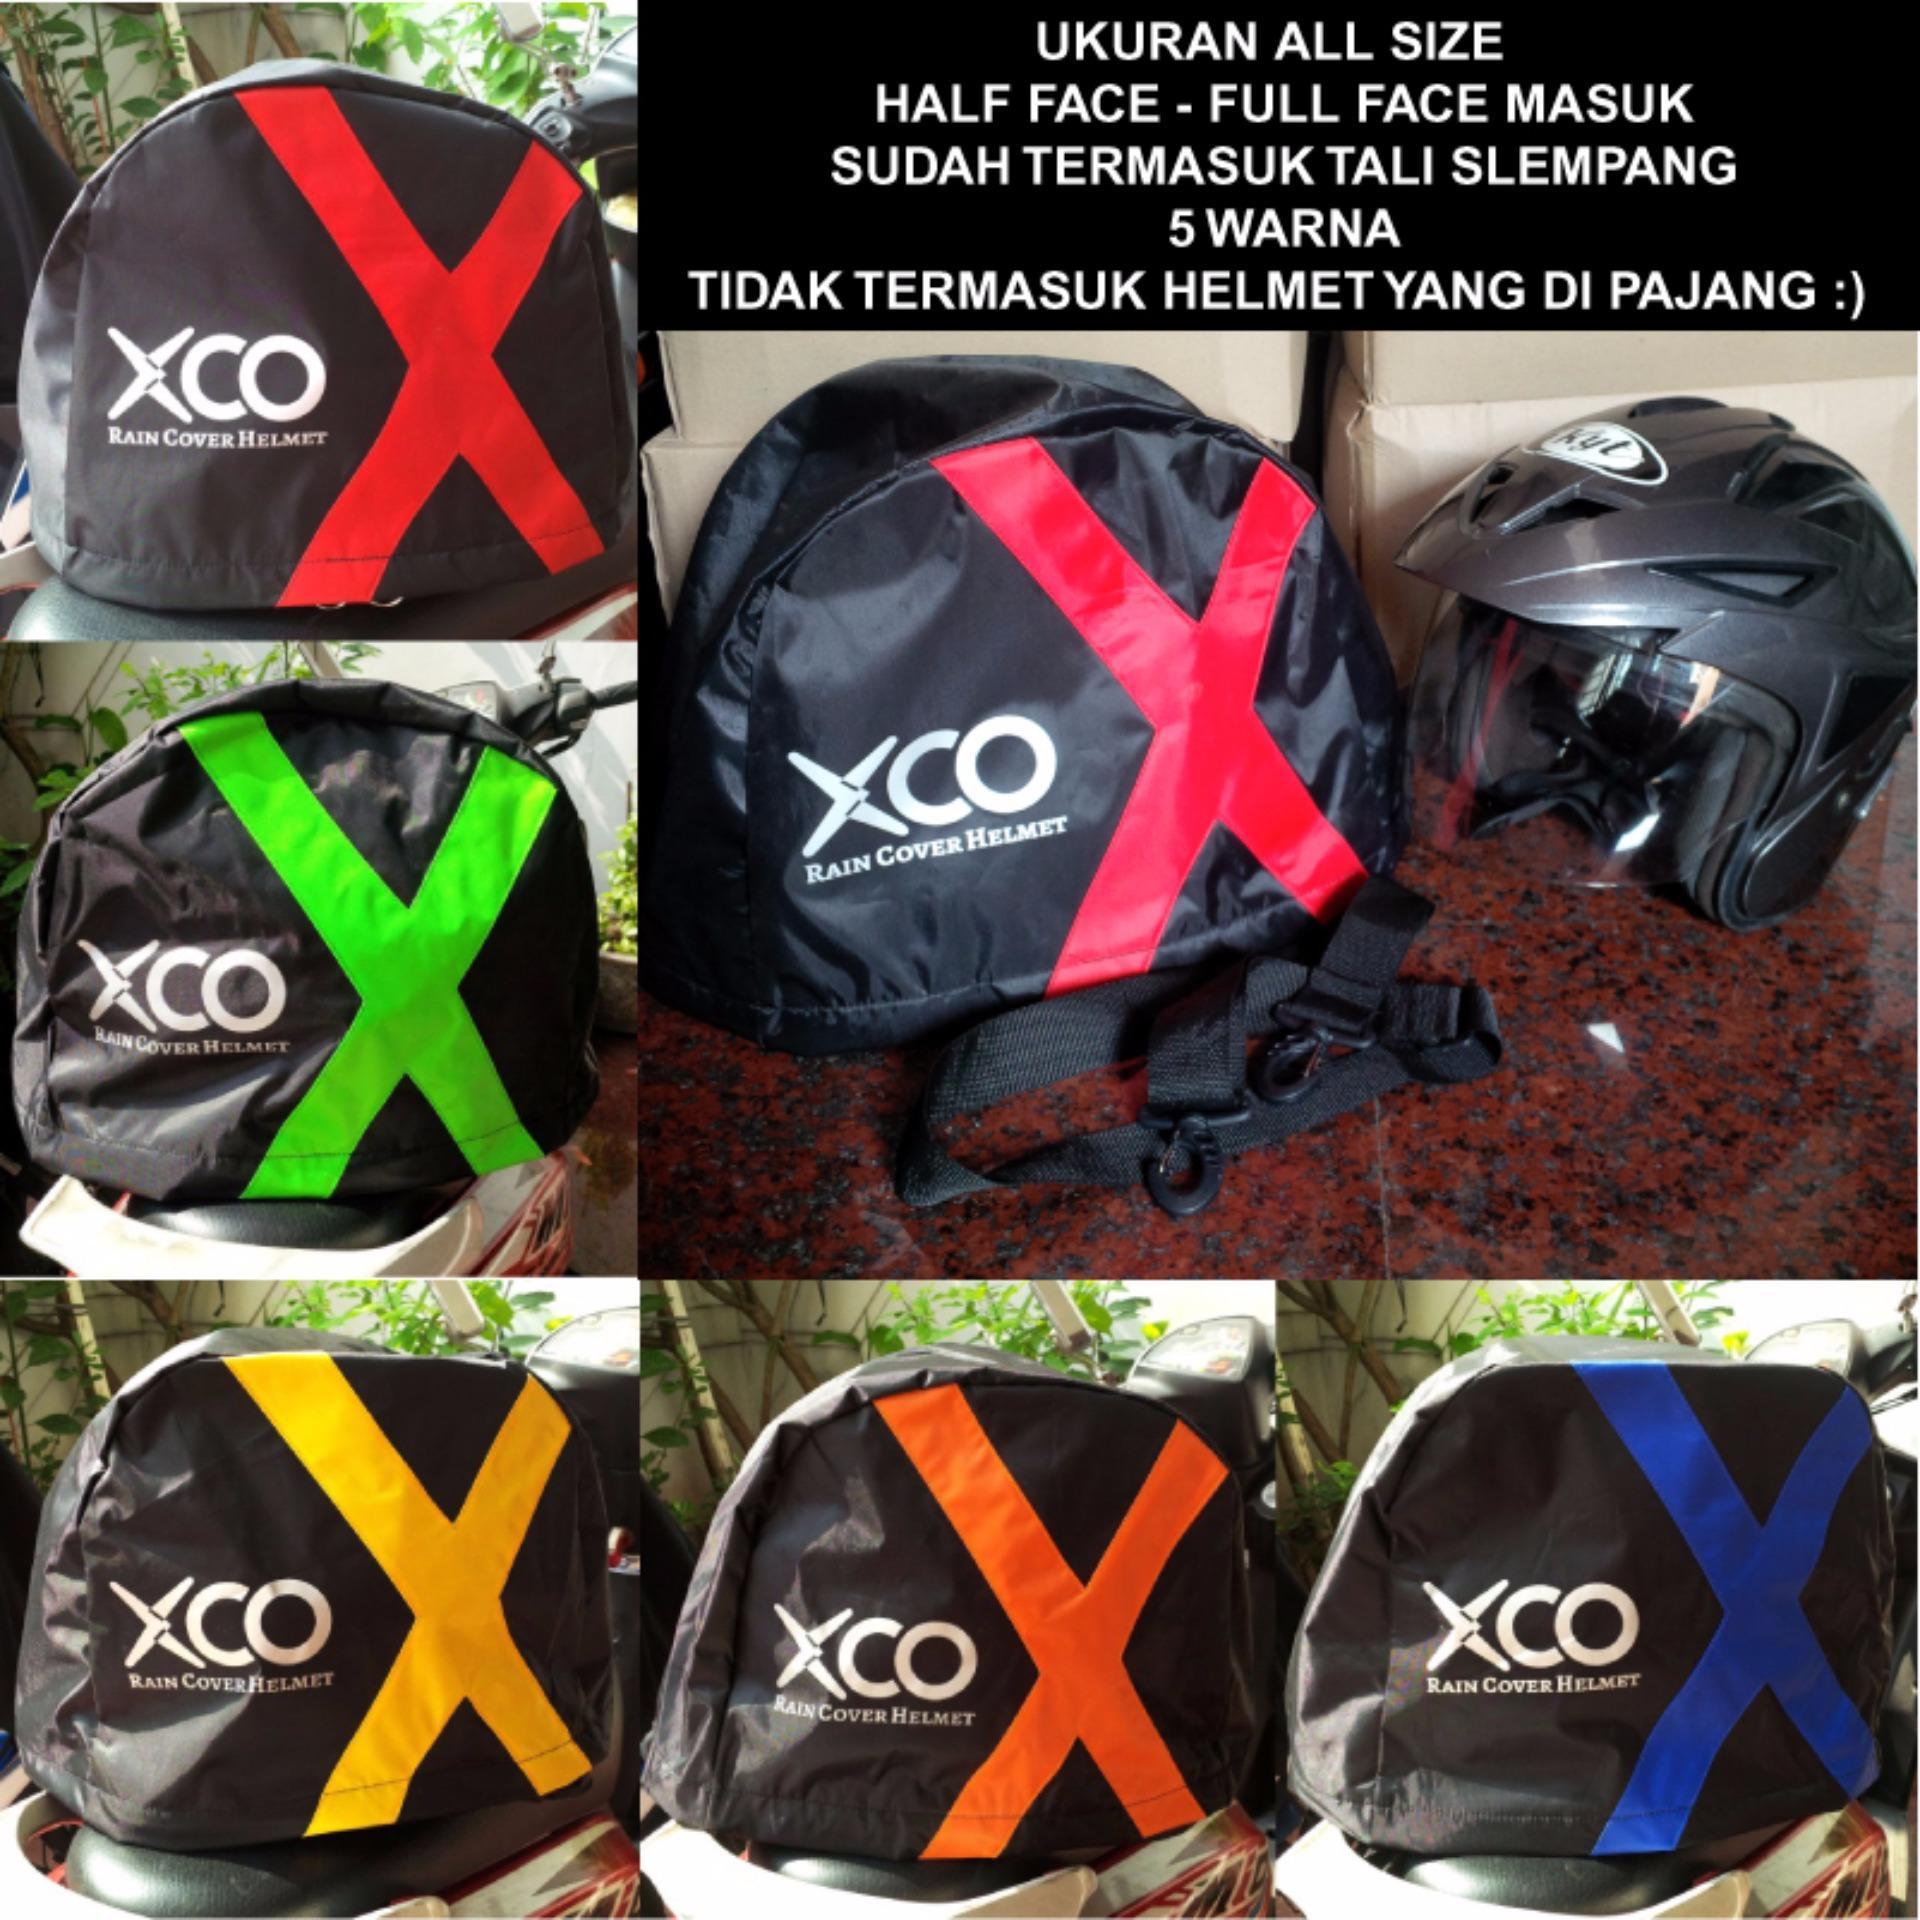 Jk Speed Tabung Bagasi Tas Jas Hujan Motor Touring Tour Biker Size Kecil Sarung Helm Anti Air Funcover Waterproofanti Original